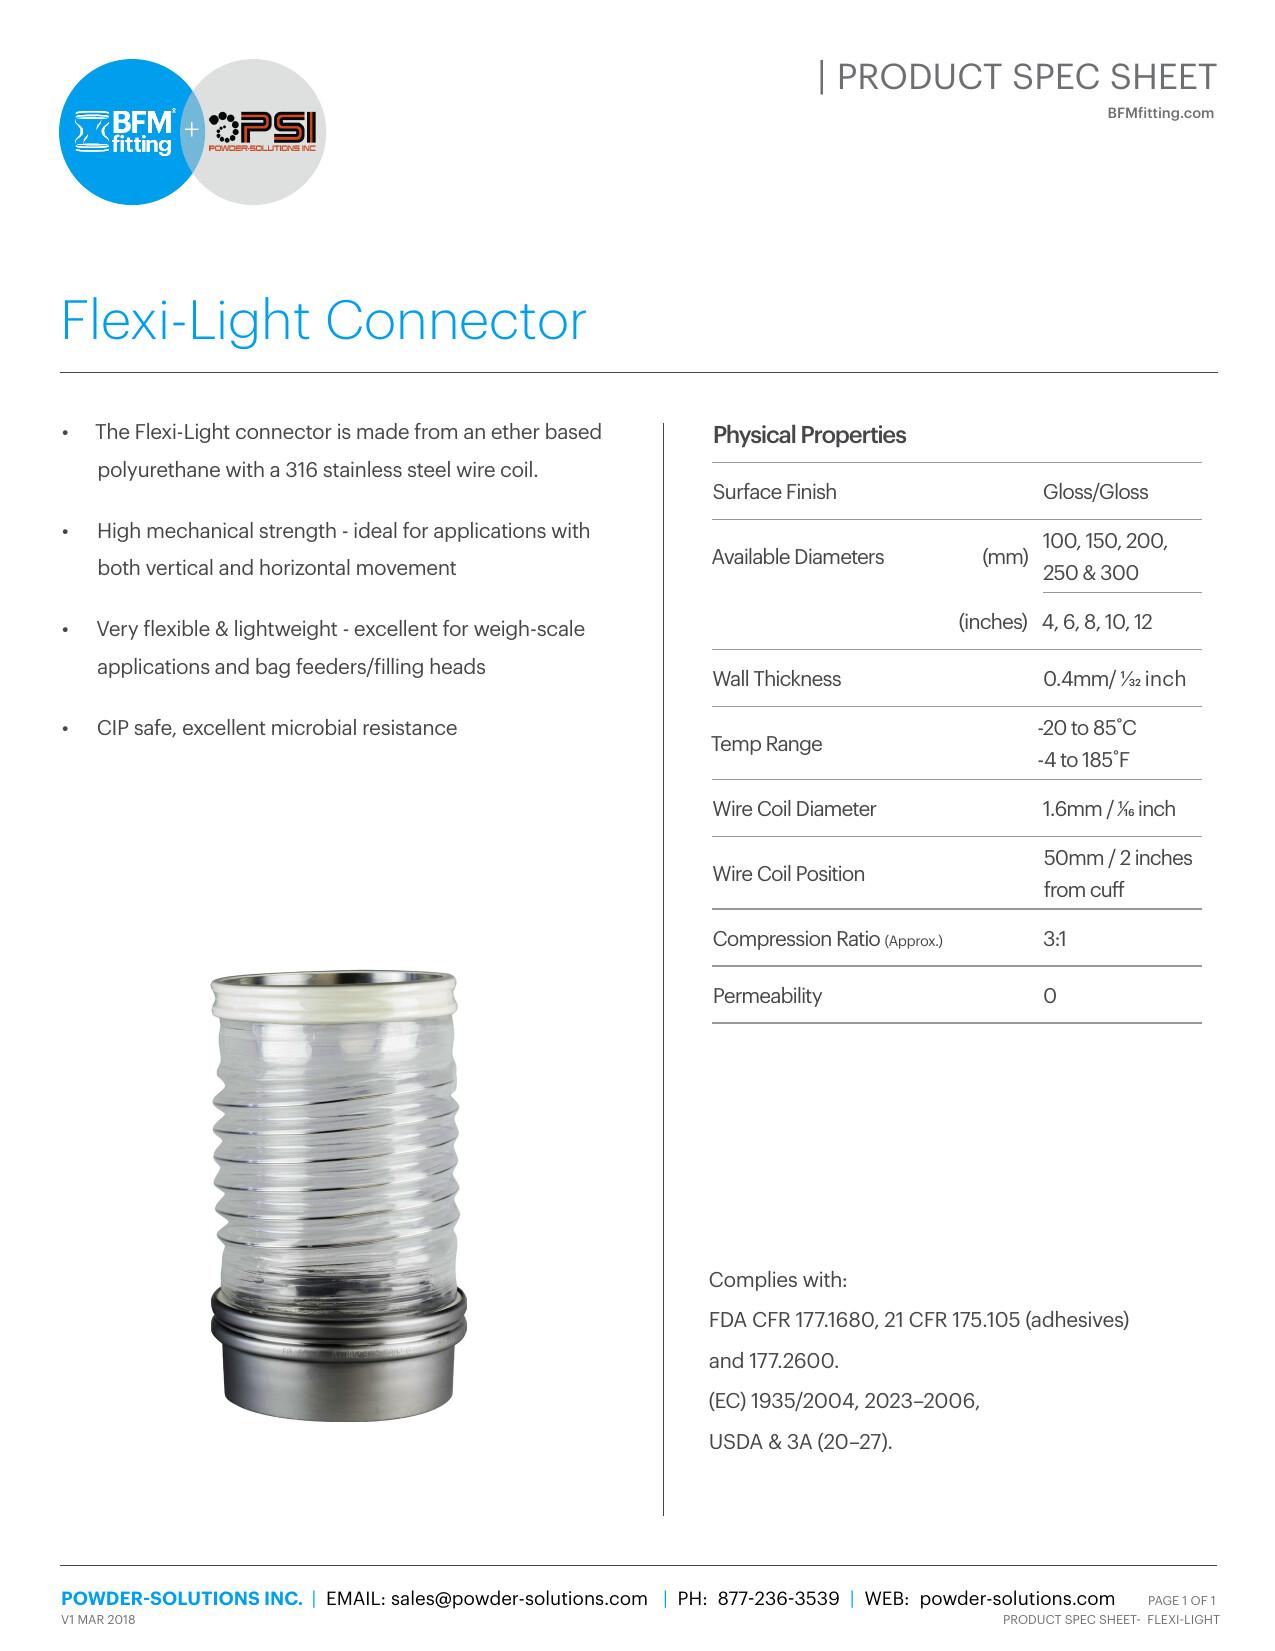 PSI BFM Spec Sheet - Flexi Light Connector V1 Mar 2018